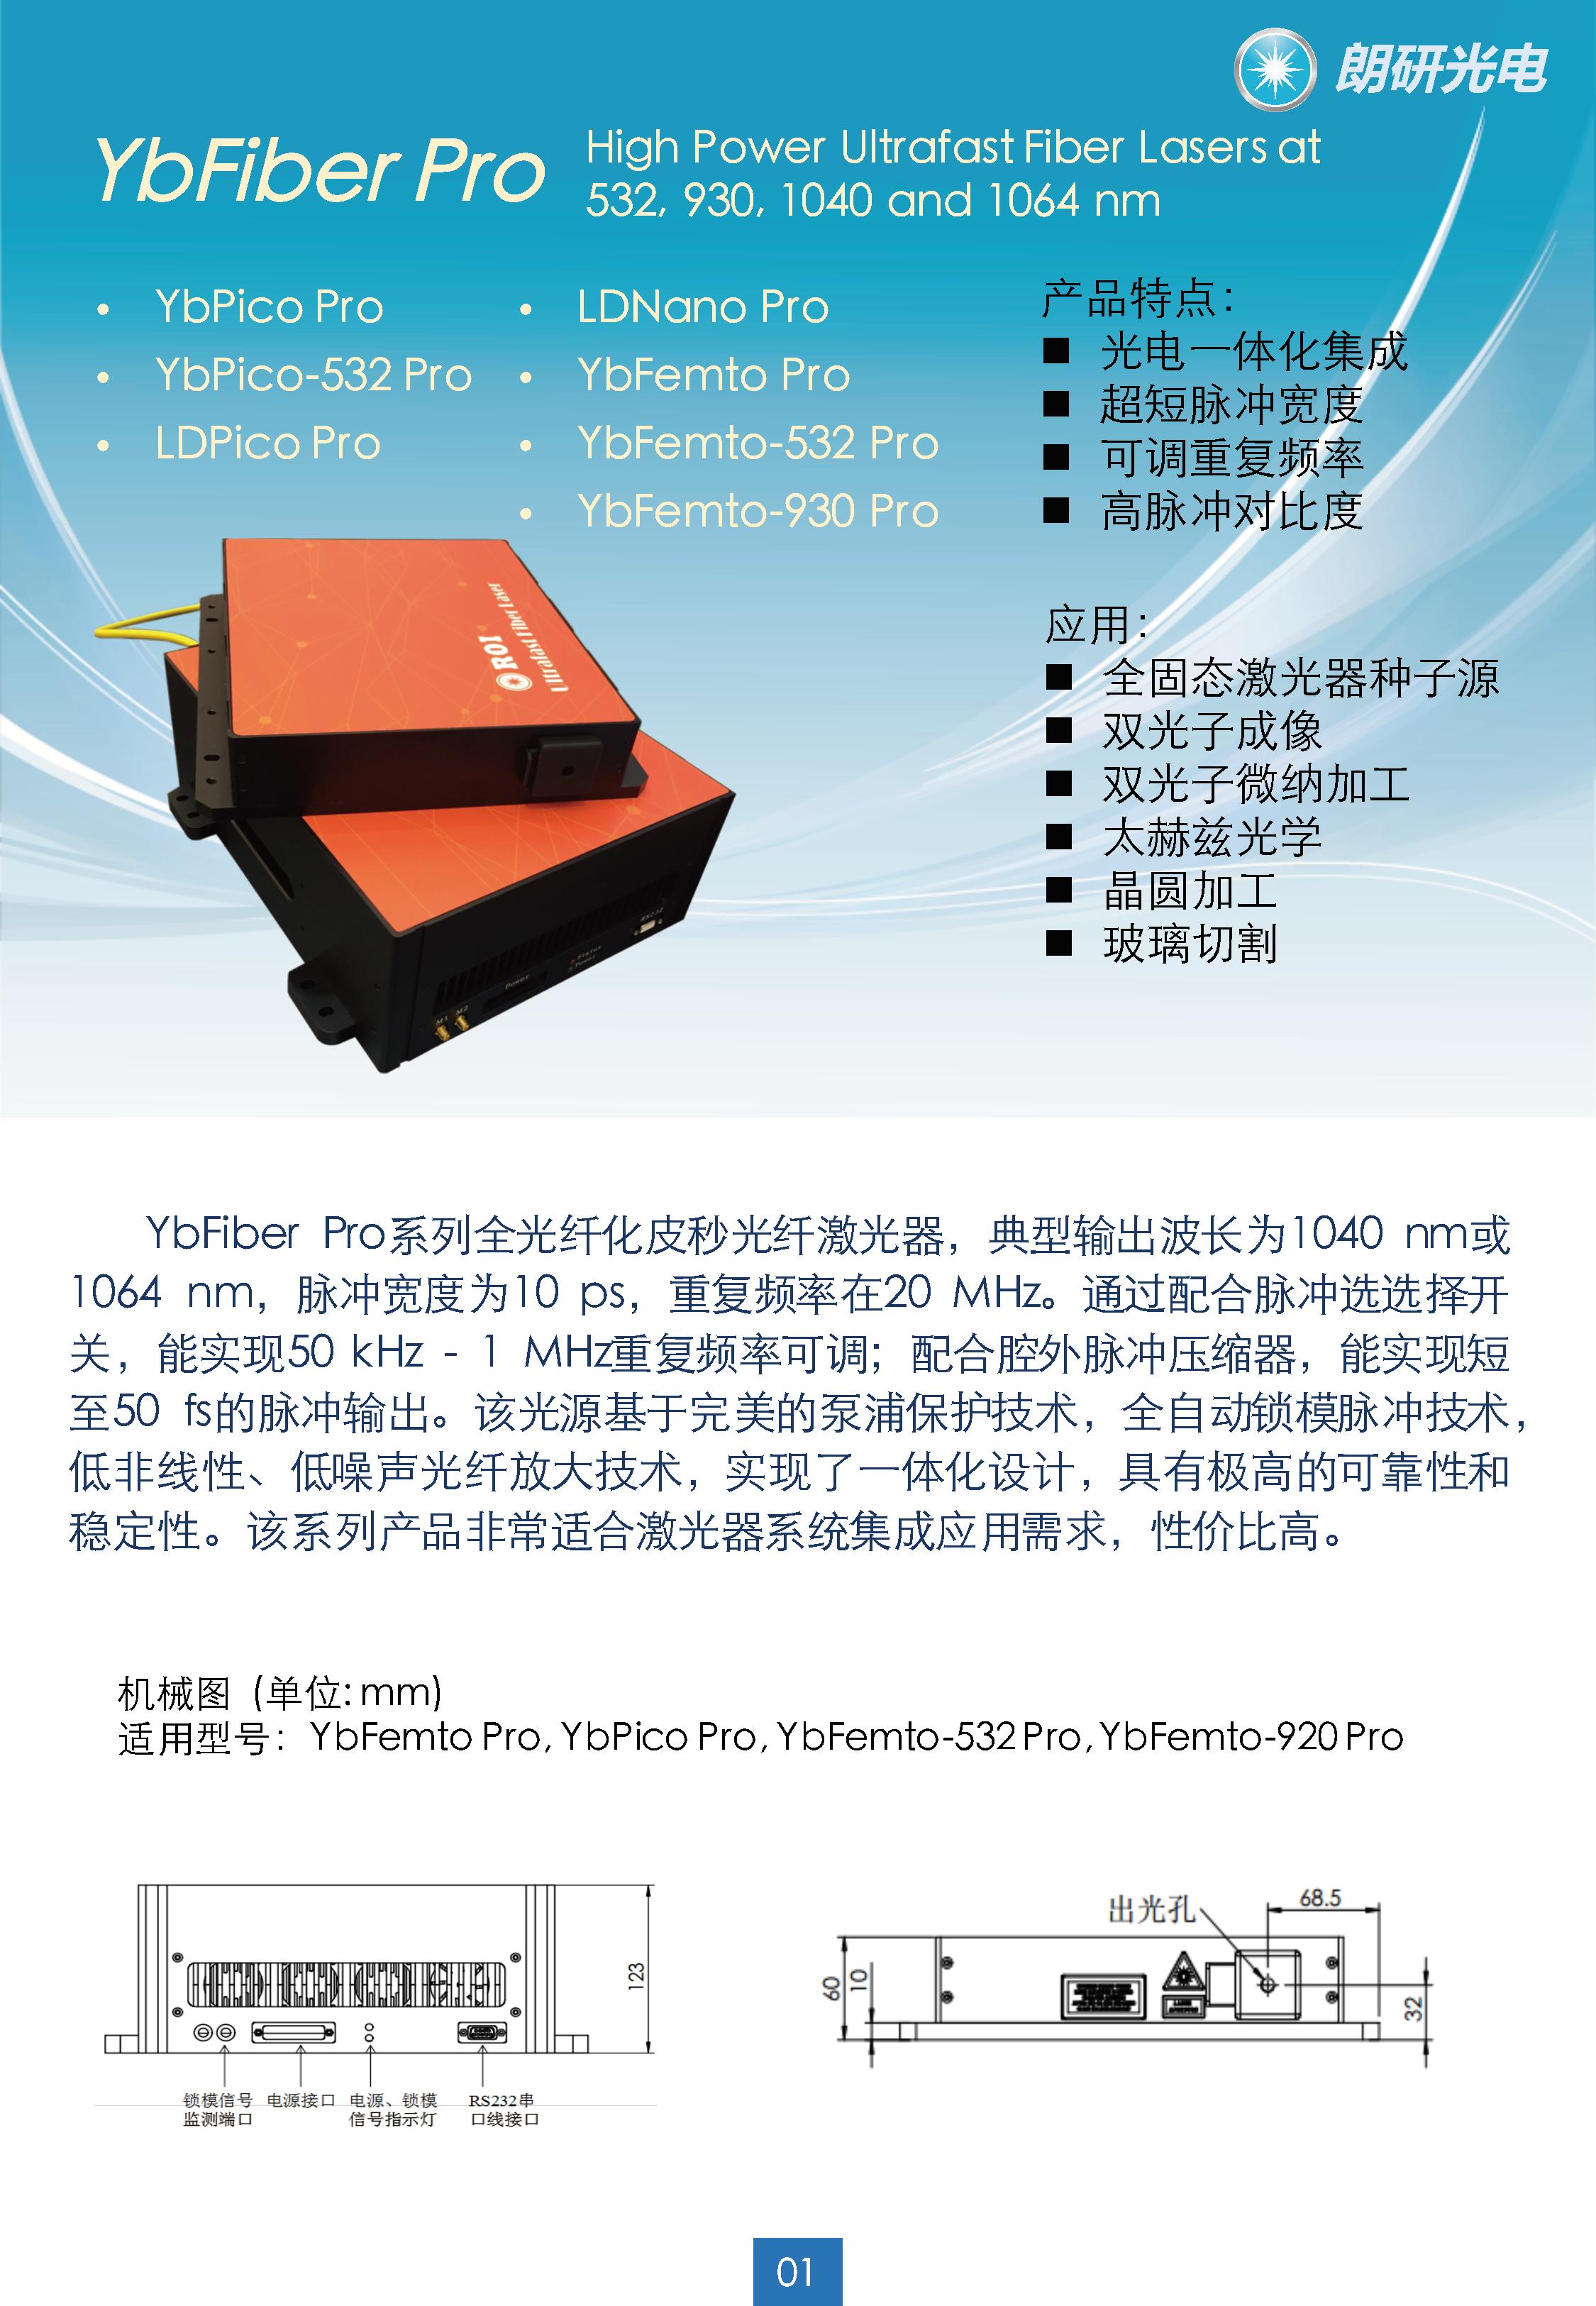 XFiber Pro 系列 - YbFiber Pro 系列_页面_1.png